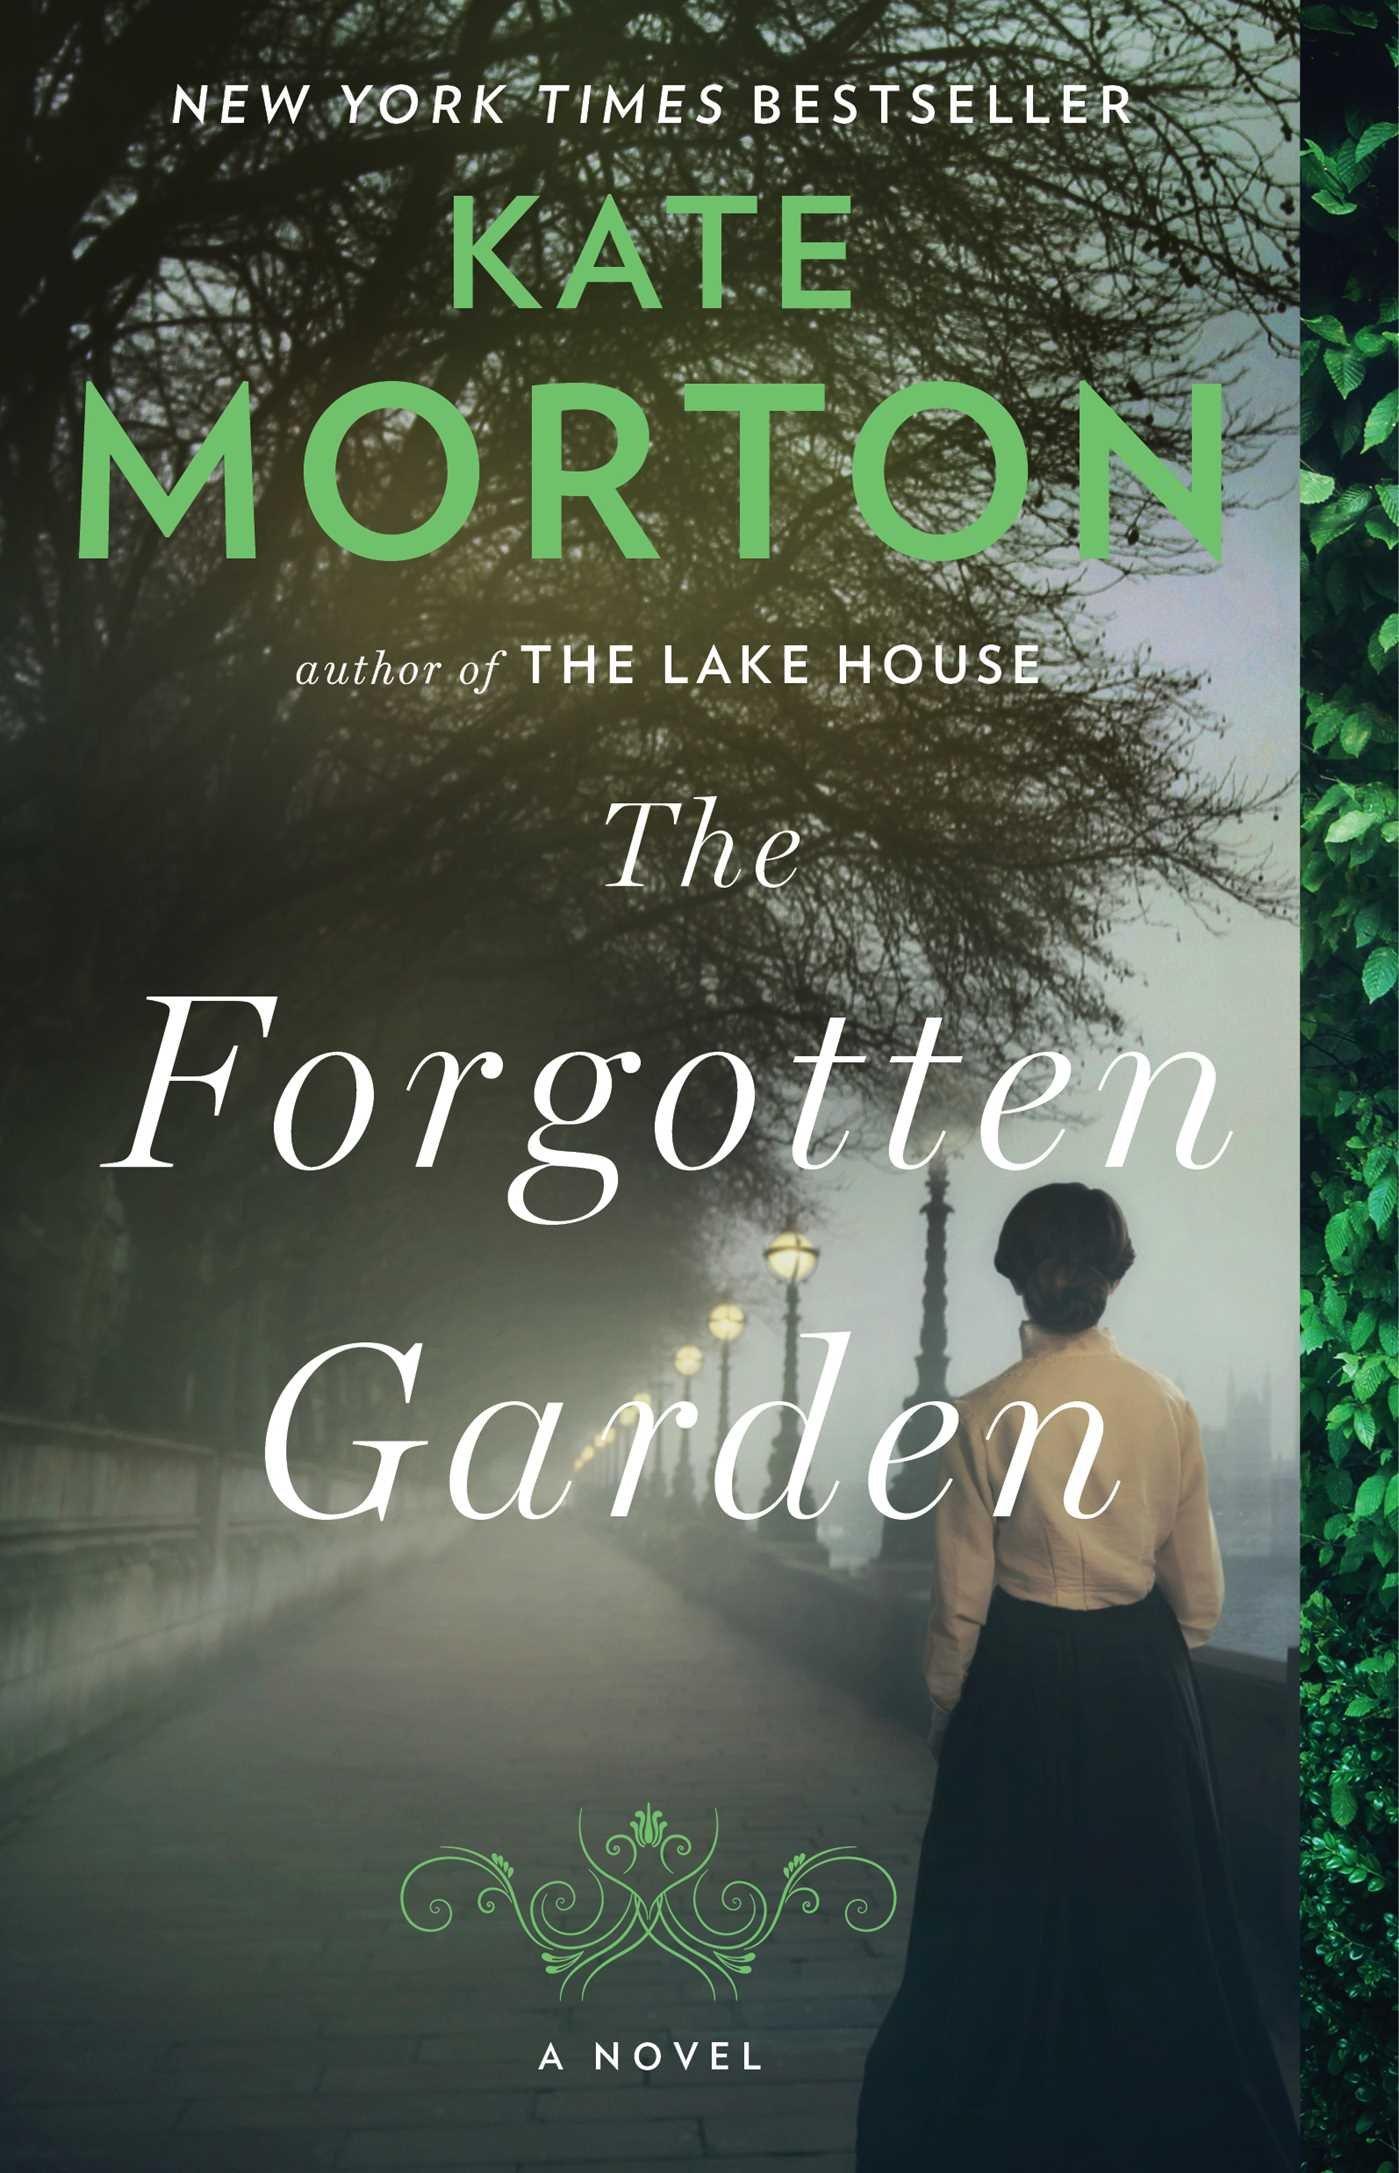 The Forgotten Garden: A Novel: Kate Morton: 9781416550556: Amazon: Books